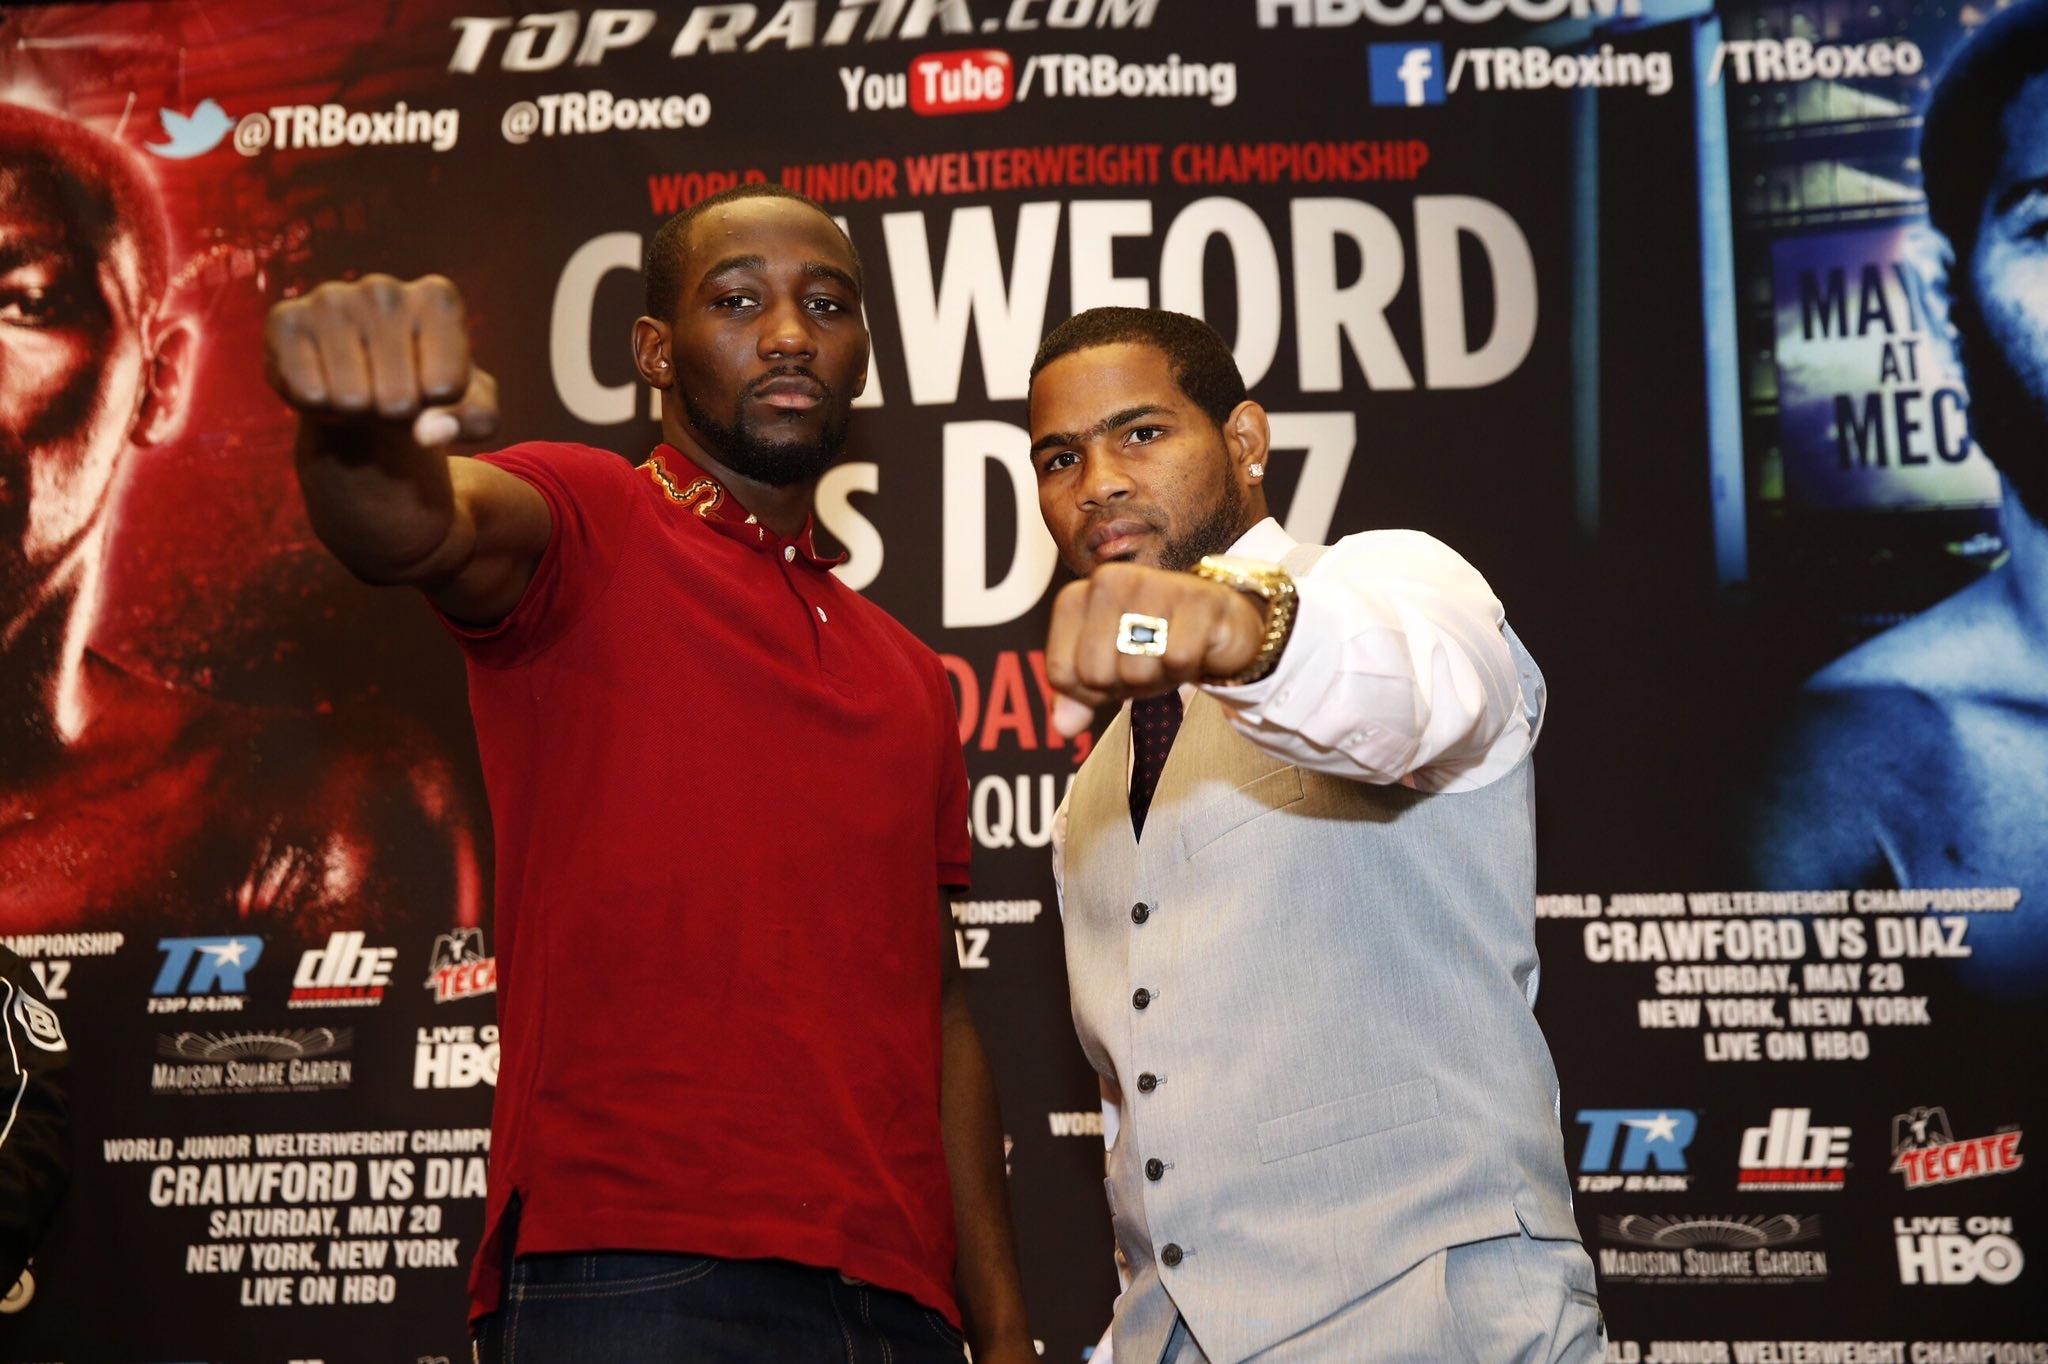 Crawford vs Diaz (Top Rank/Mikey Williams)